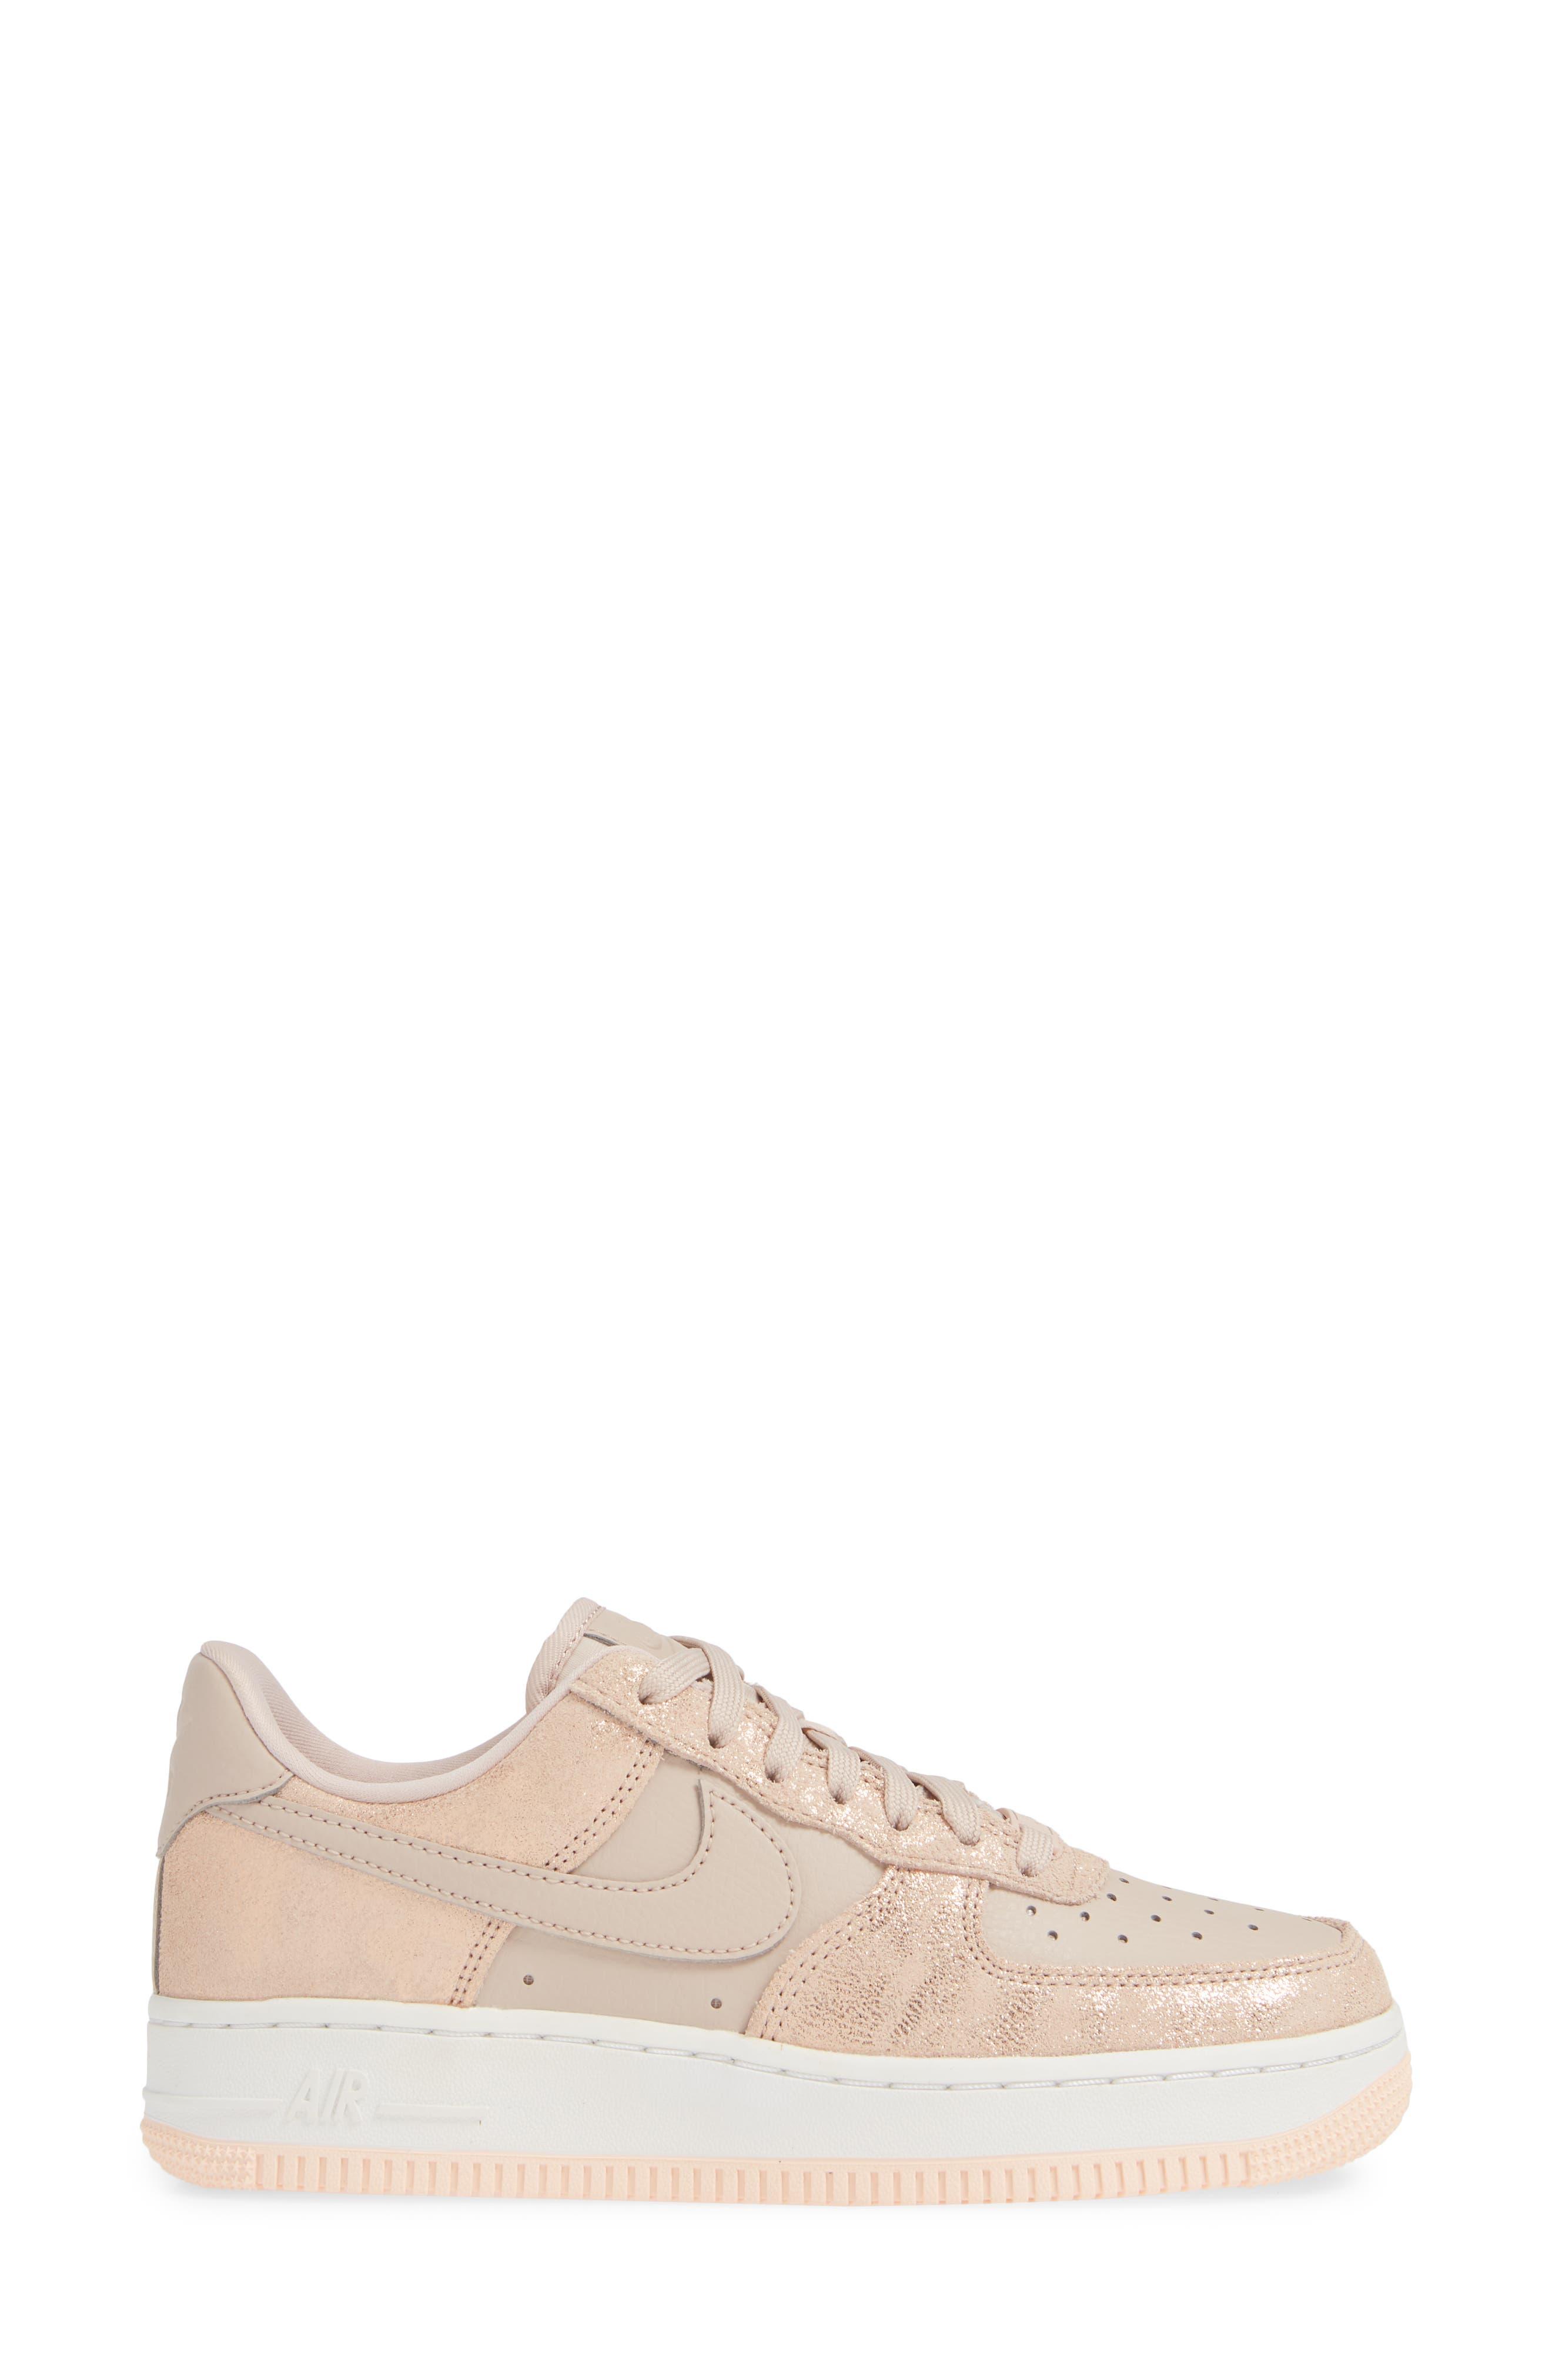 Air Force 1 '07 Premium Sneaker,                             Alternate thumbnail 3, color,                             RED BRONZE/ PARTICLE BEIGE